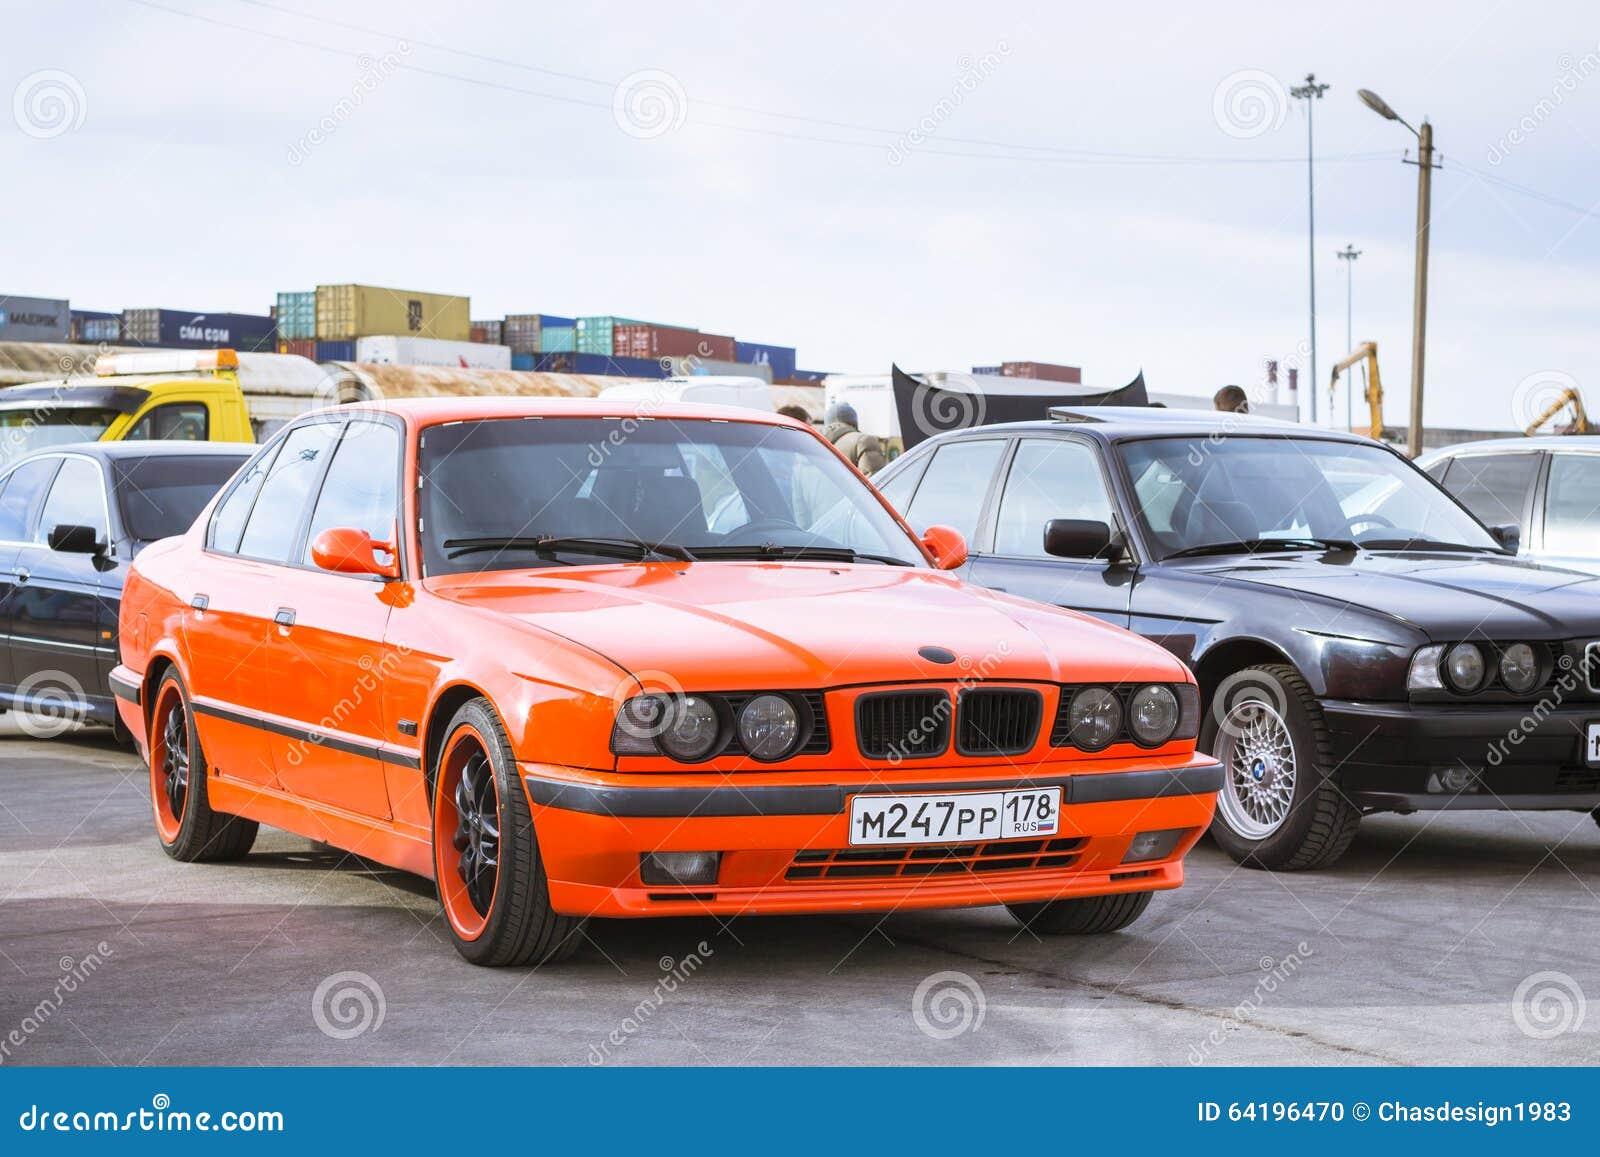 Used Cars In St Petersburg Russia